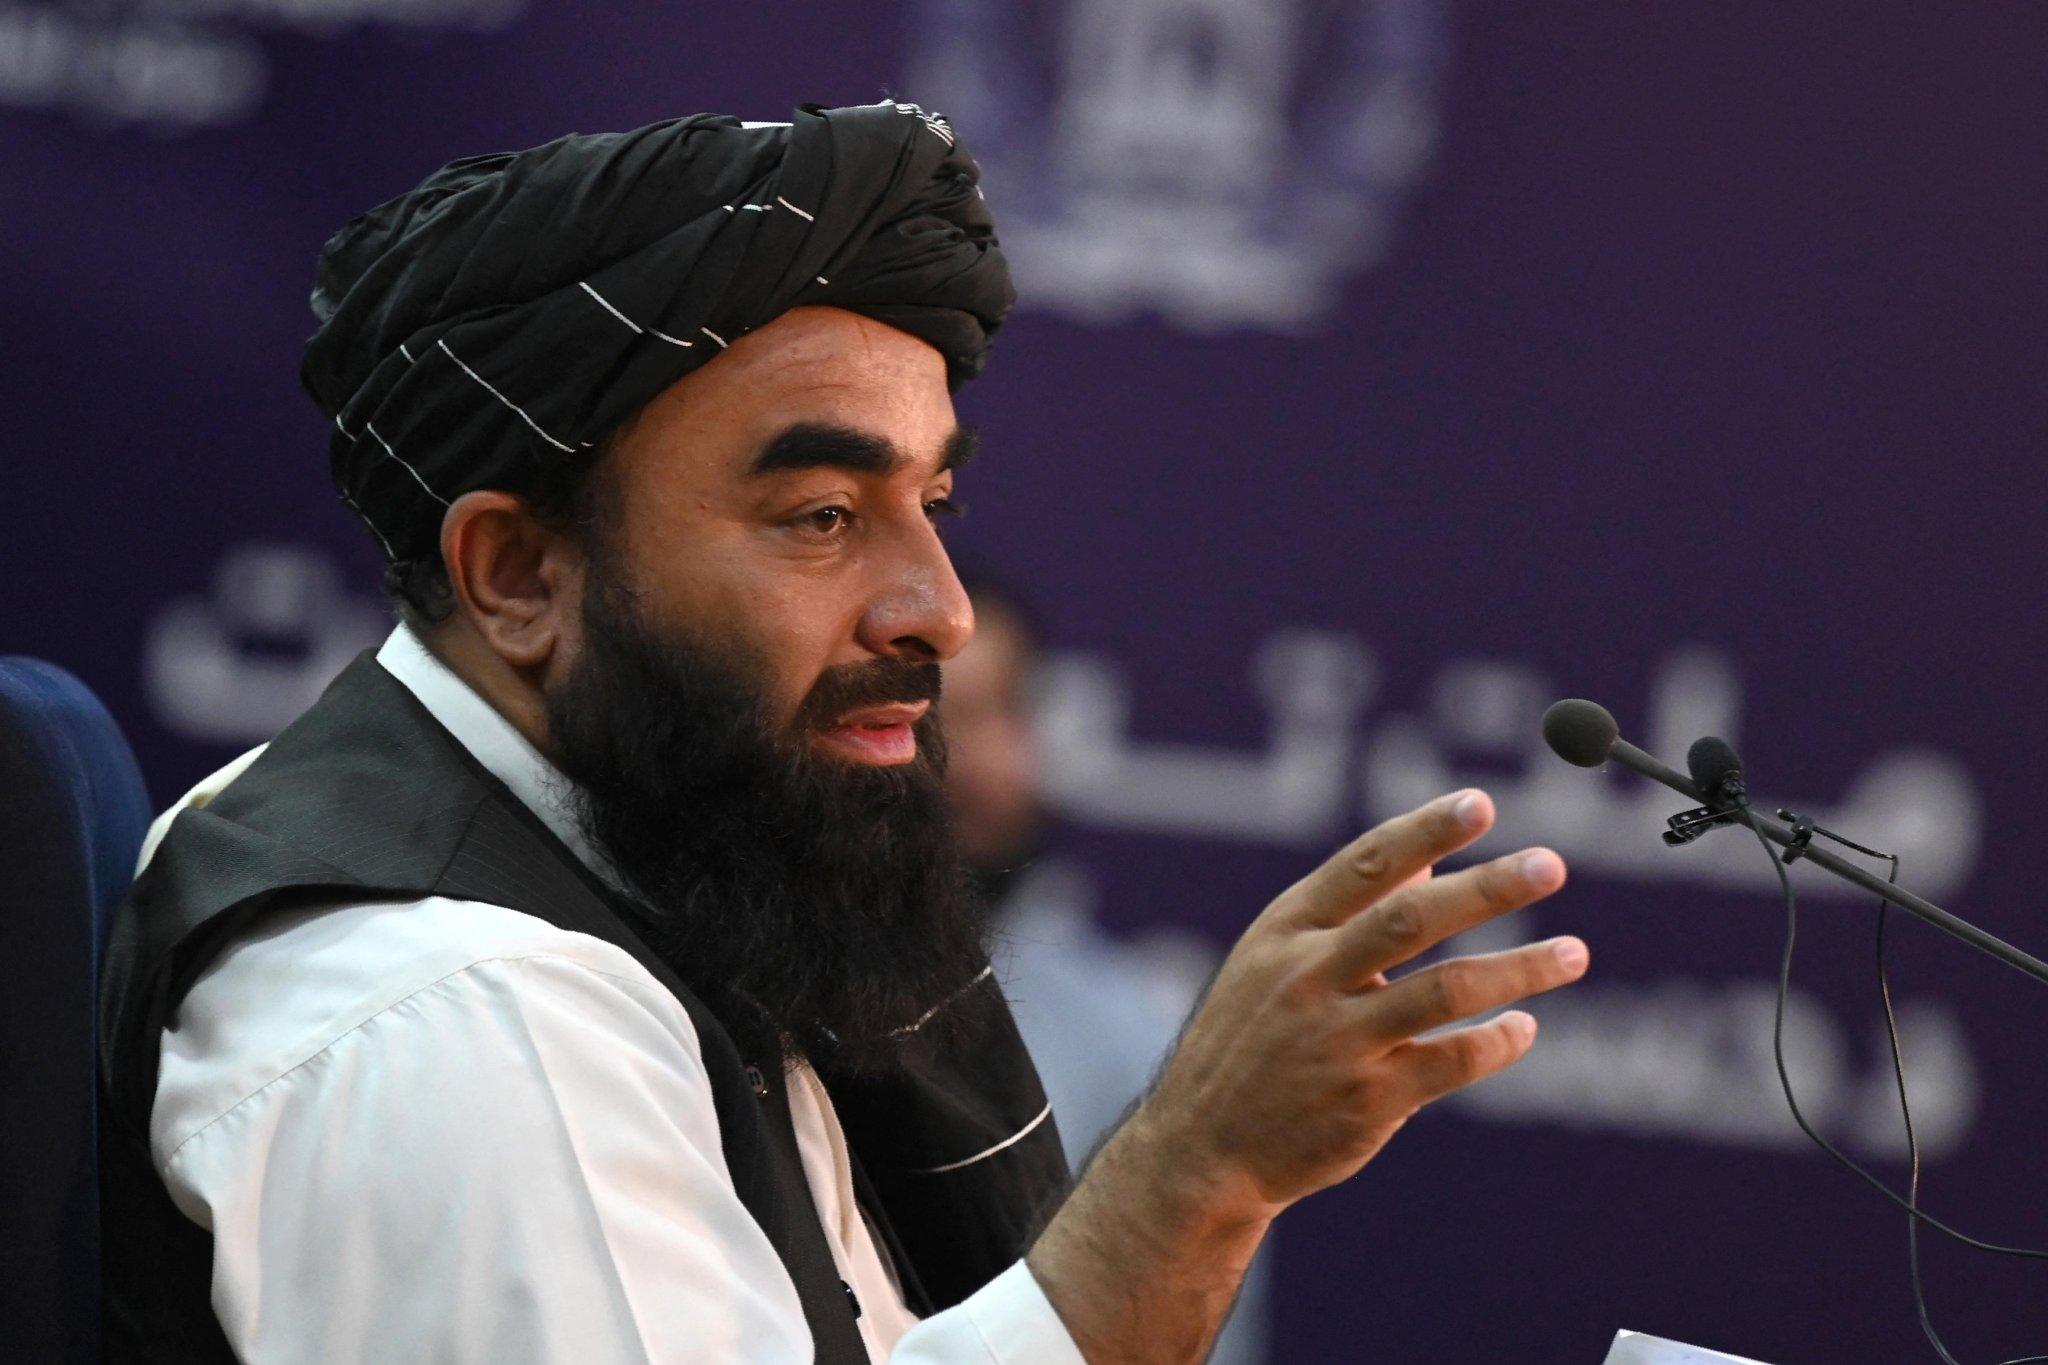 Afghanistan, talebani annunciano ministri governo: mullah Hassan è premier